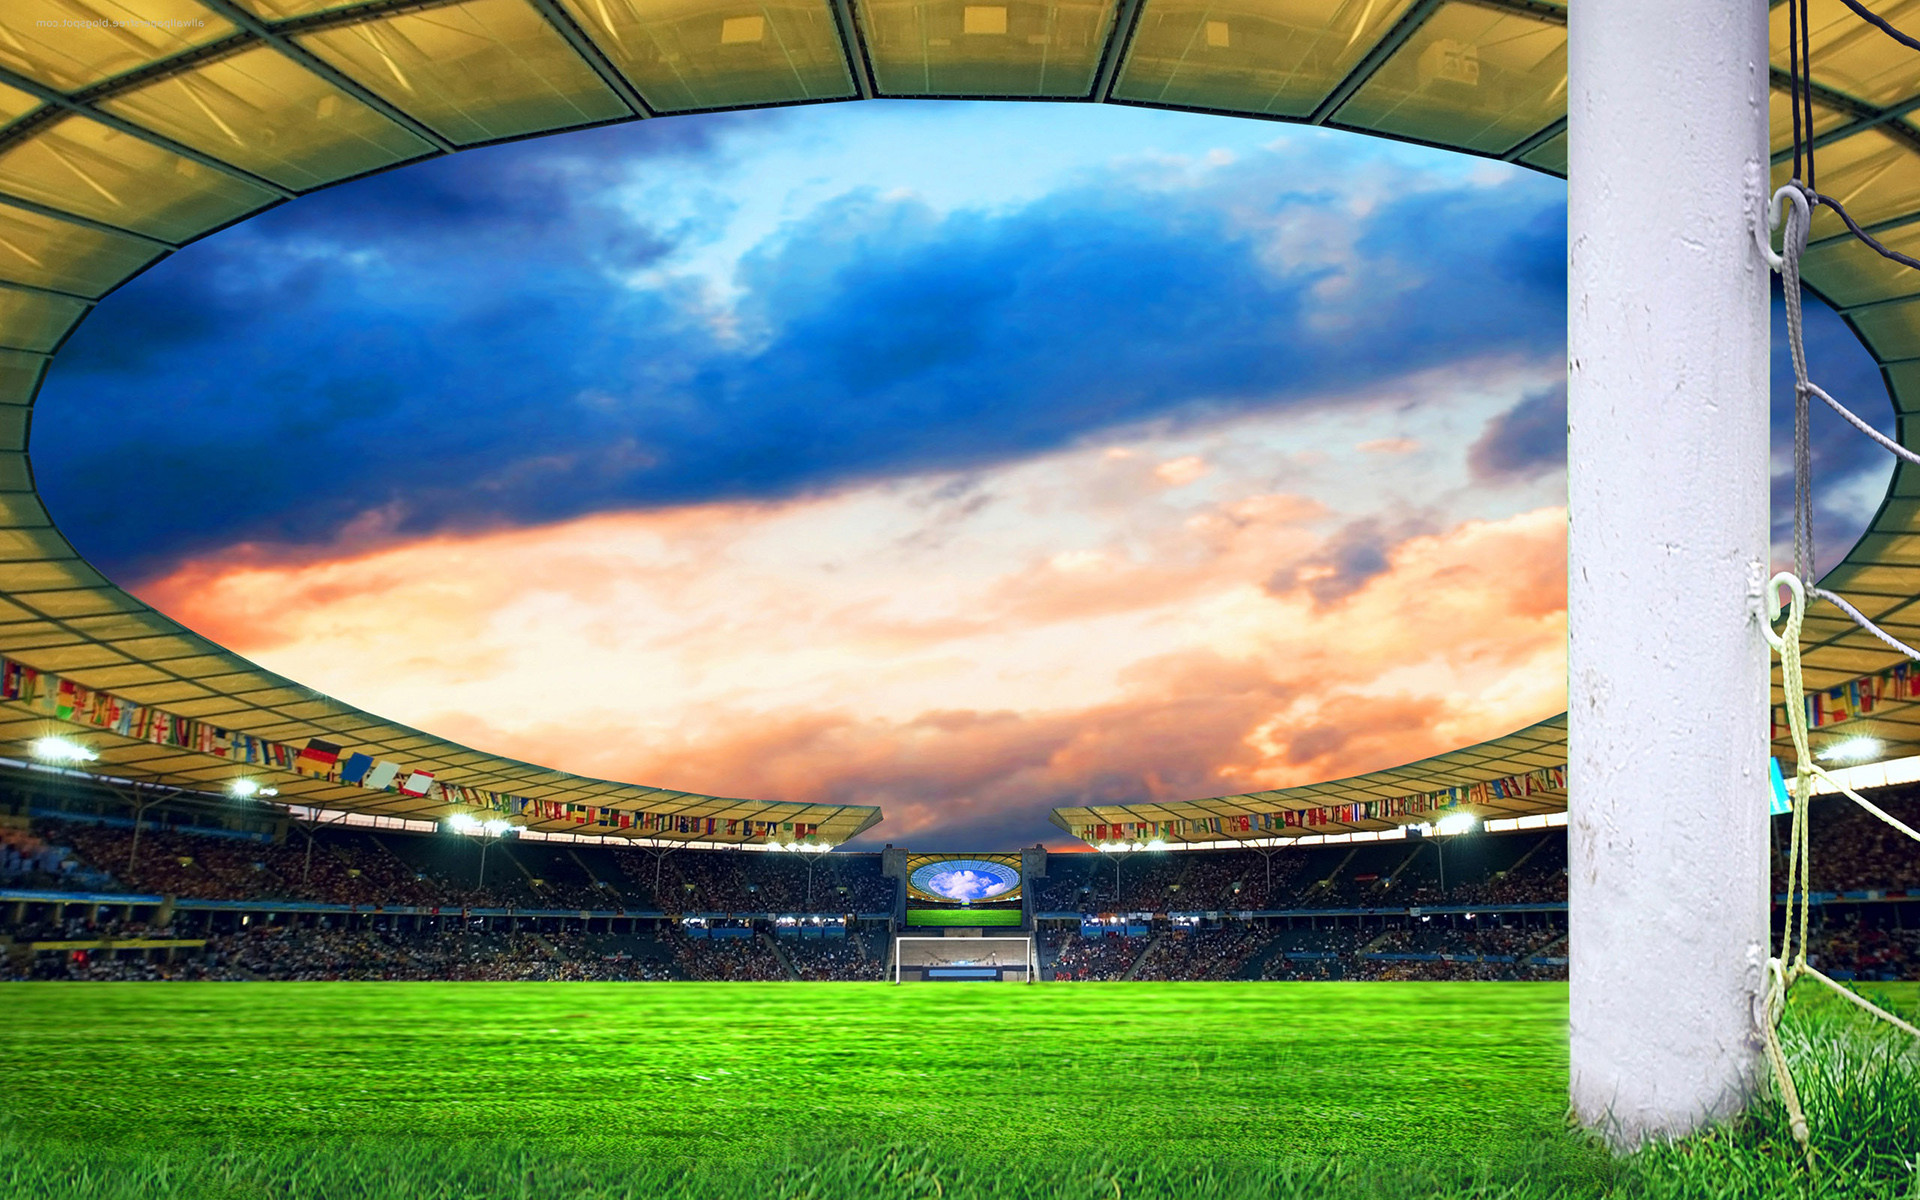 High Resolution Football Wallpapers Group 86: HD Football Field Wallpaper (63+ Images